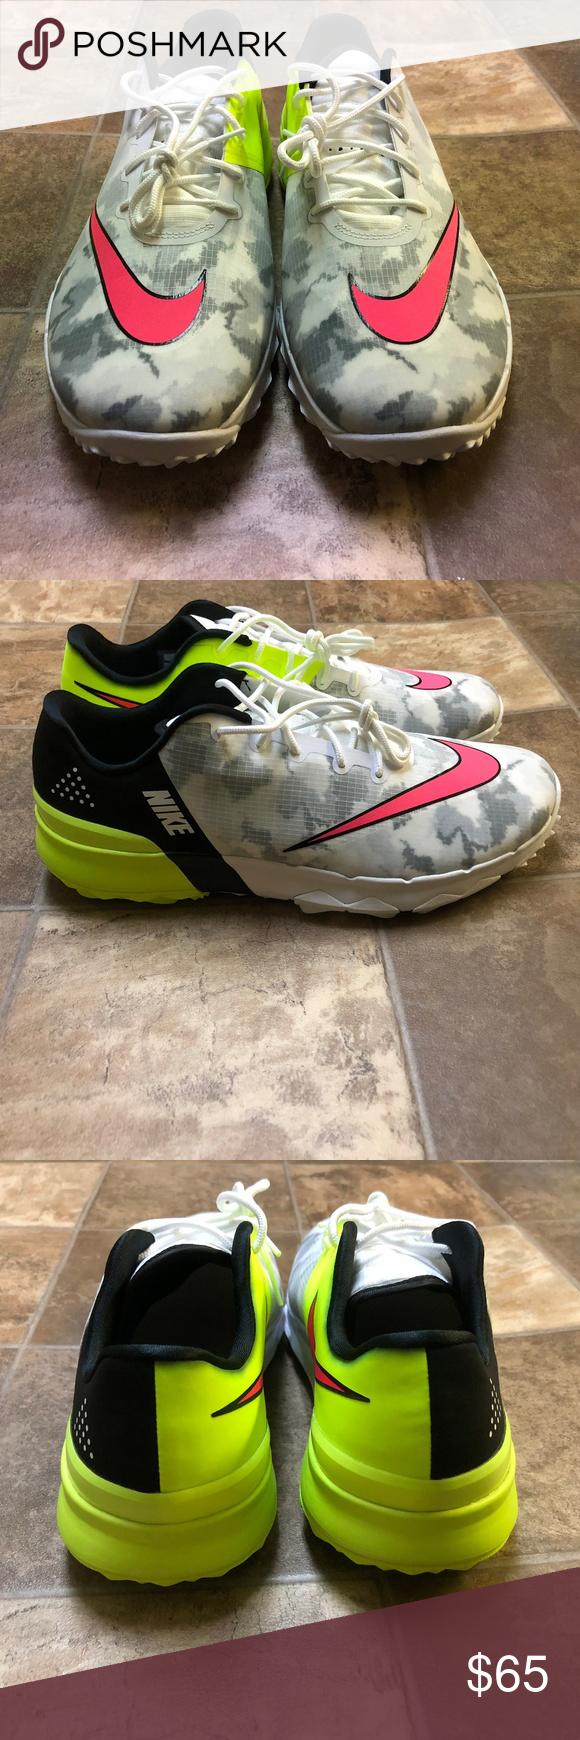 5df060862759 Nike FI Flex Golf Shoes Turf Grip Volt Sz 9 Nike FI Flex Golf Shoes White